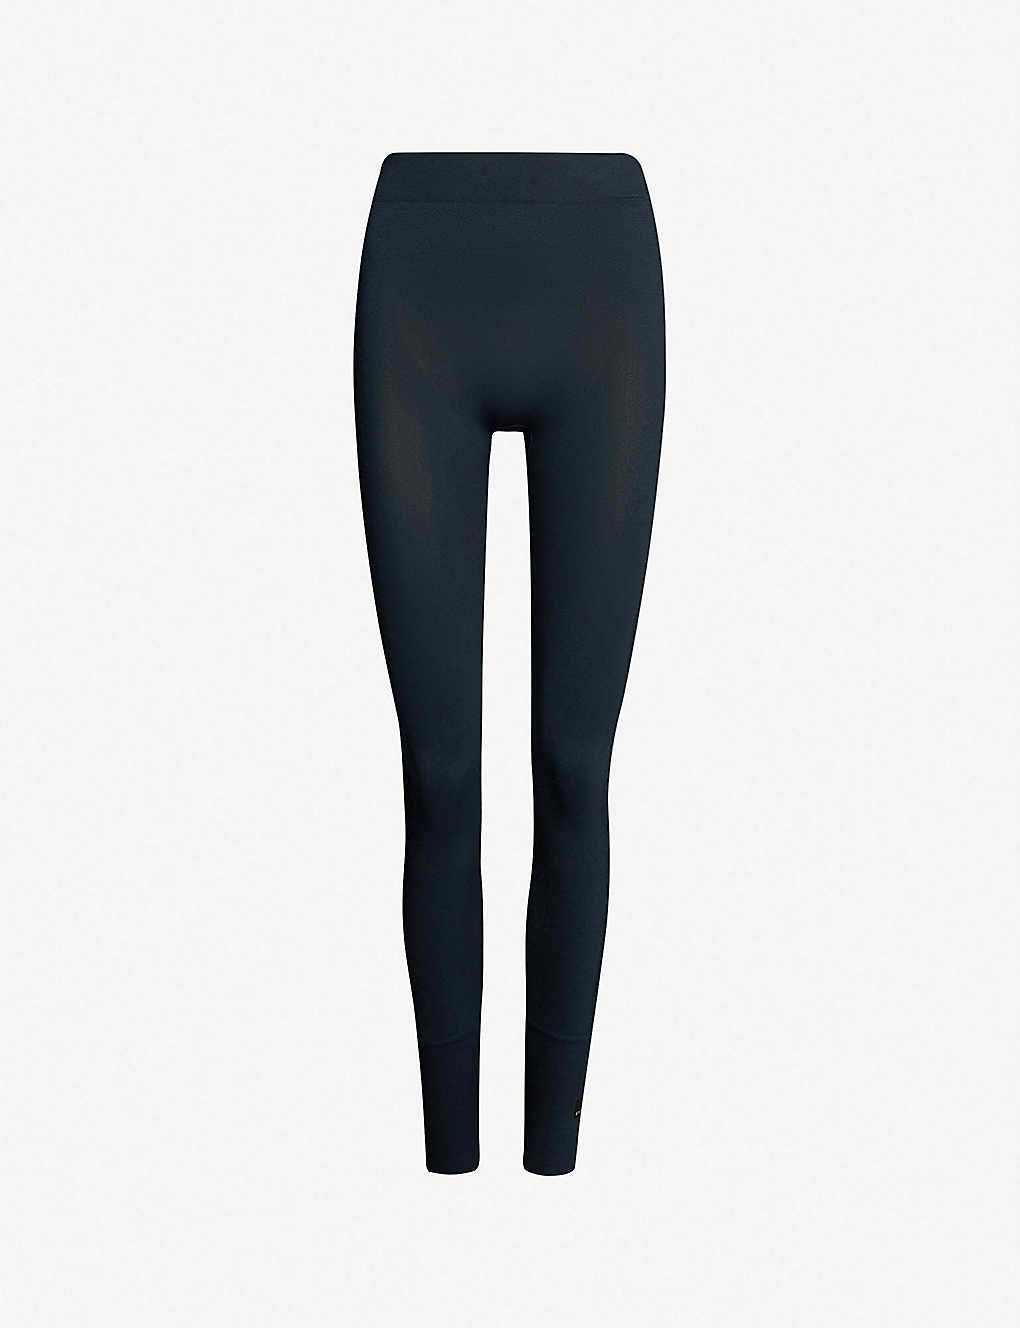 e3ca85ea208 ADIDAS BY STELLA MCCARTNEY - Seamless stretch-jersey leggings ...